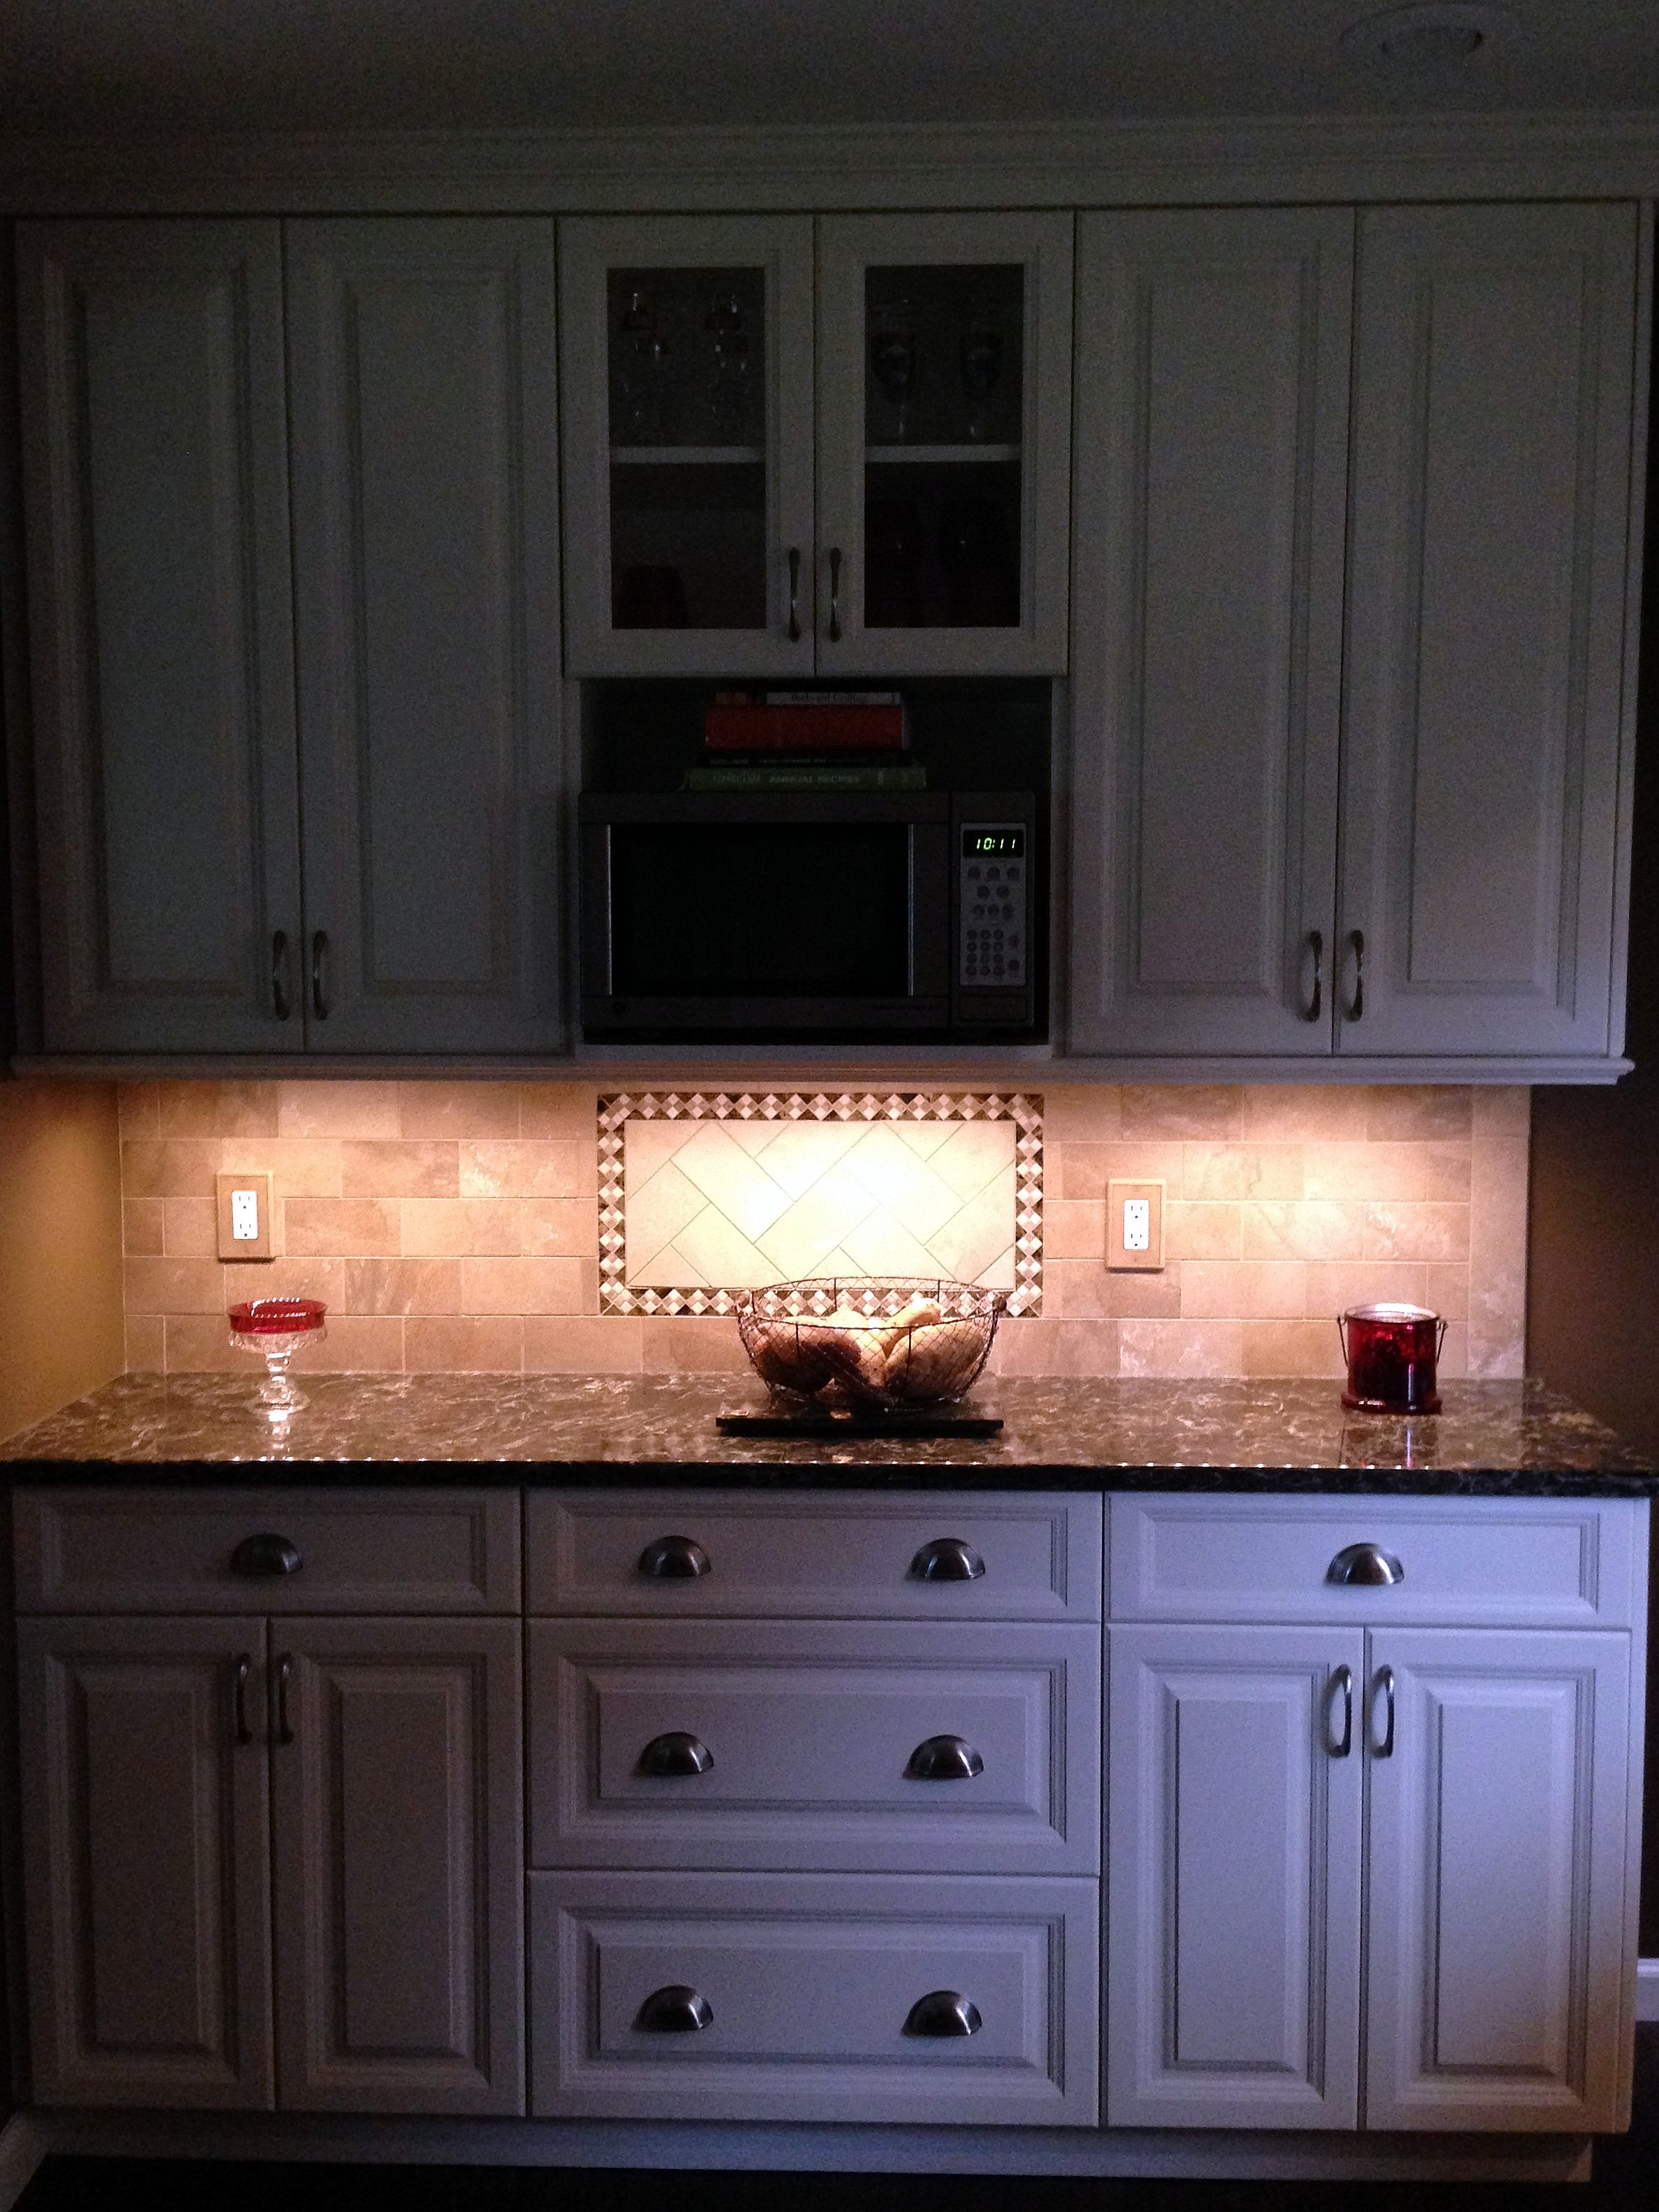 Interior Millbrook Kitchen Cabinets white millbrook kitchen with laneshaw quartz countertops 2 of 10 10